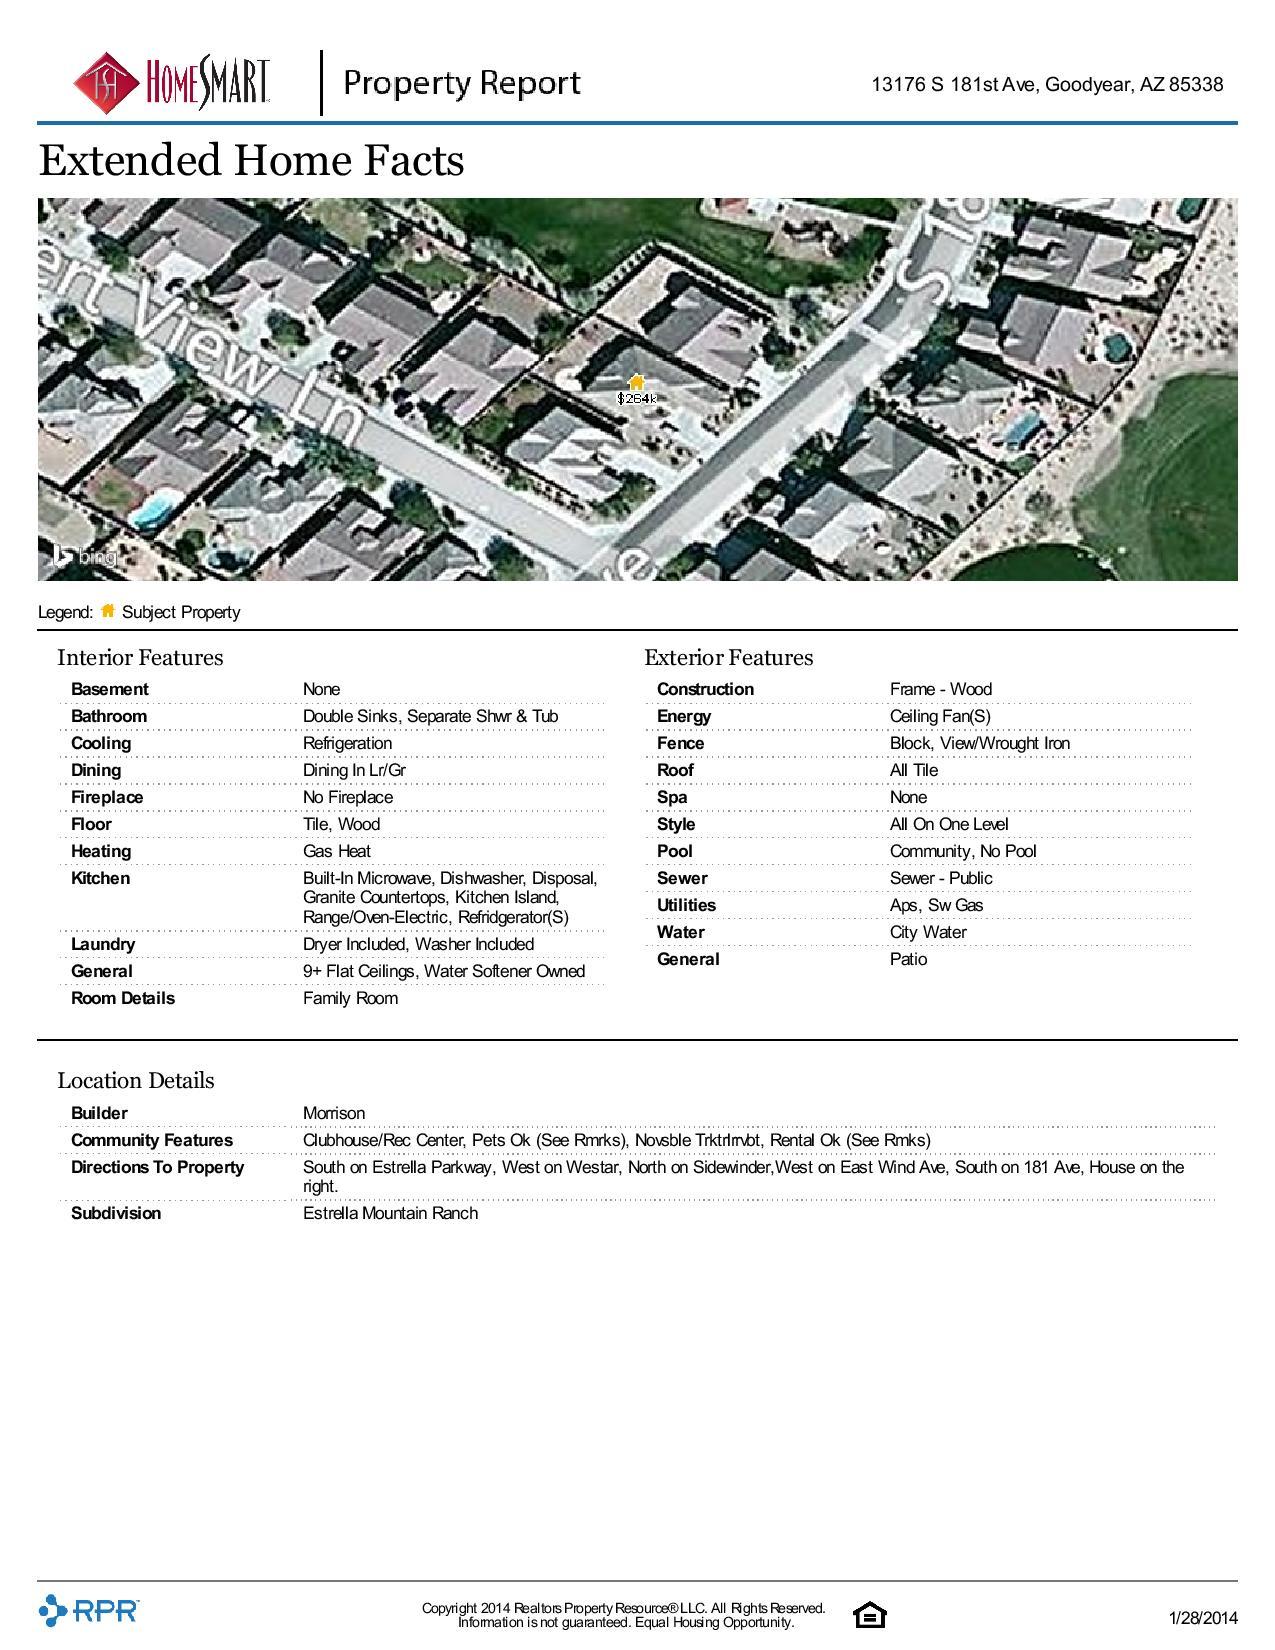 13176-S-181st-Ave-Goodyear-AZ-85338.pdf-page-004